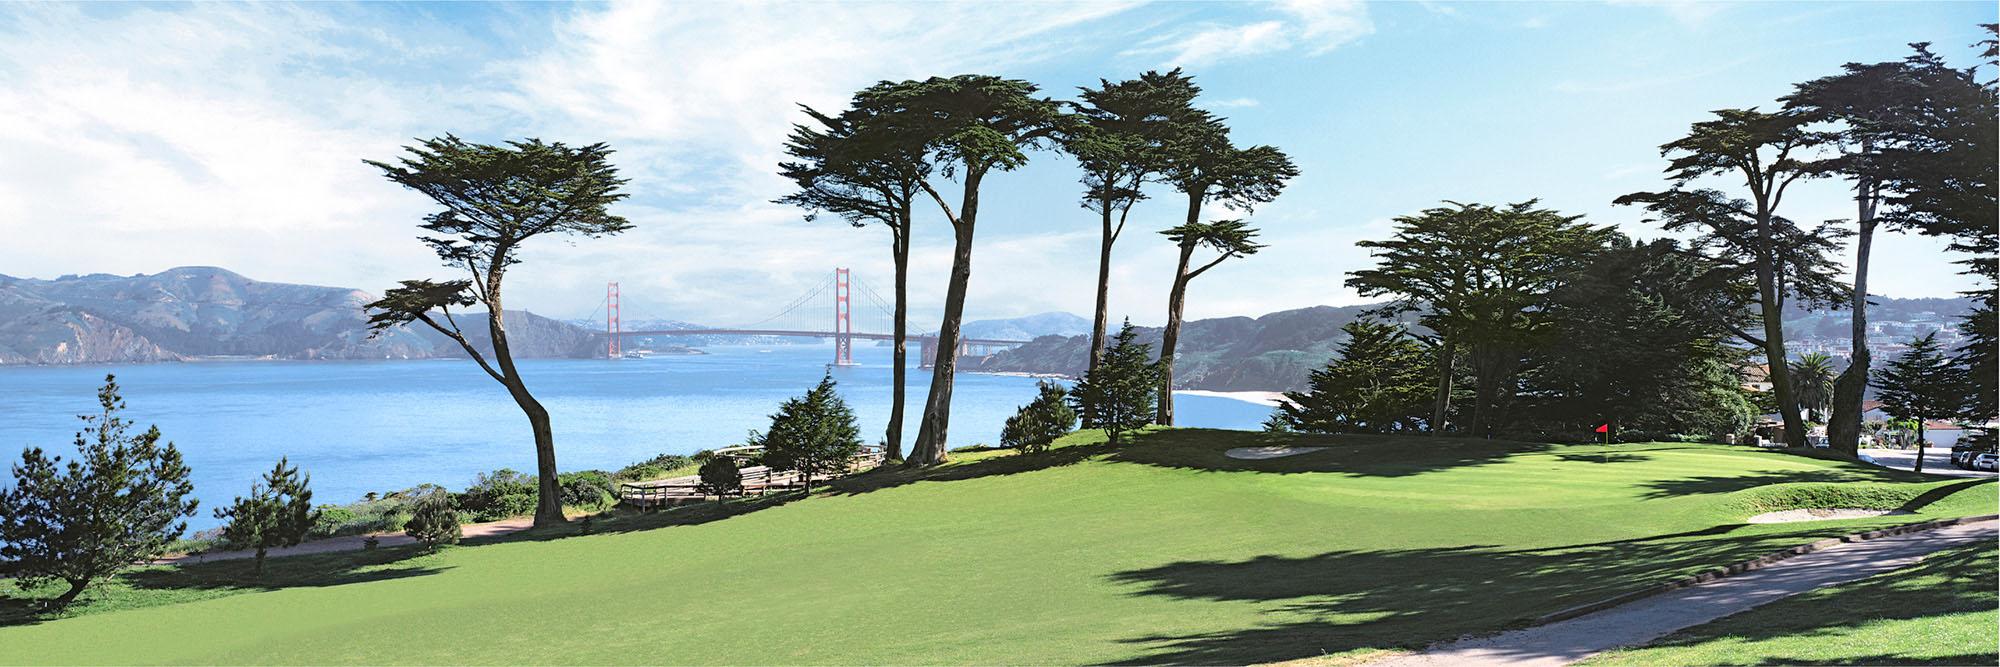 Golf Course Image - Lincoln Park No. 17